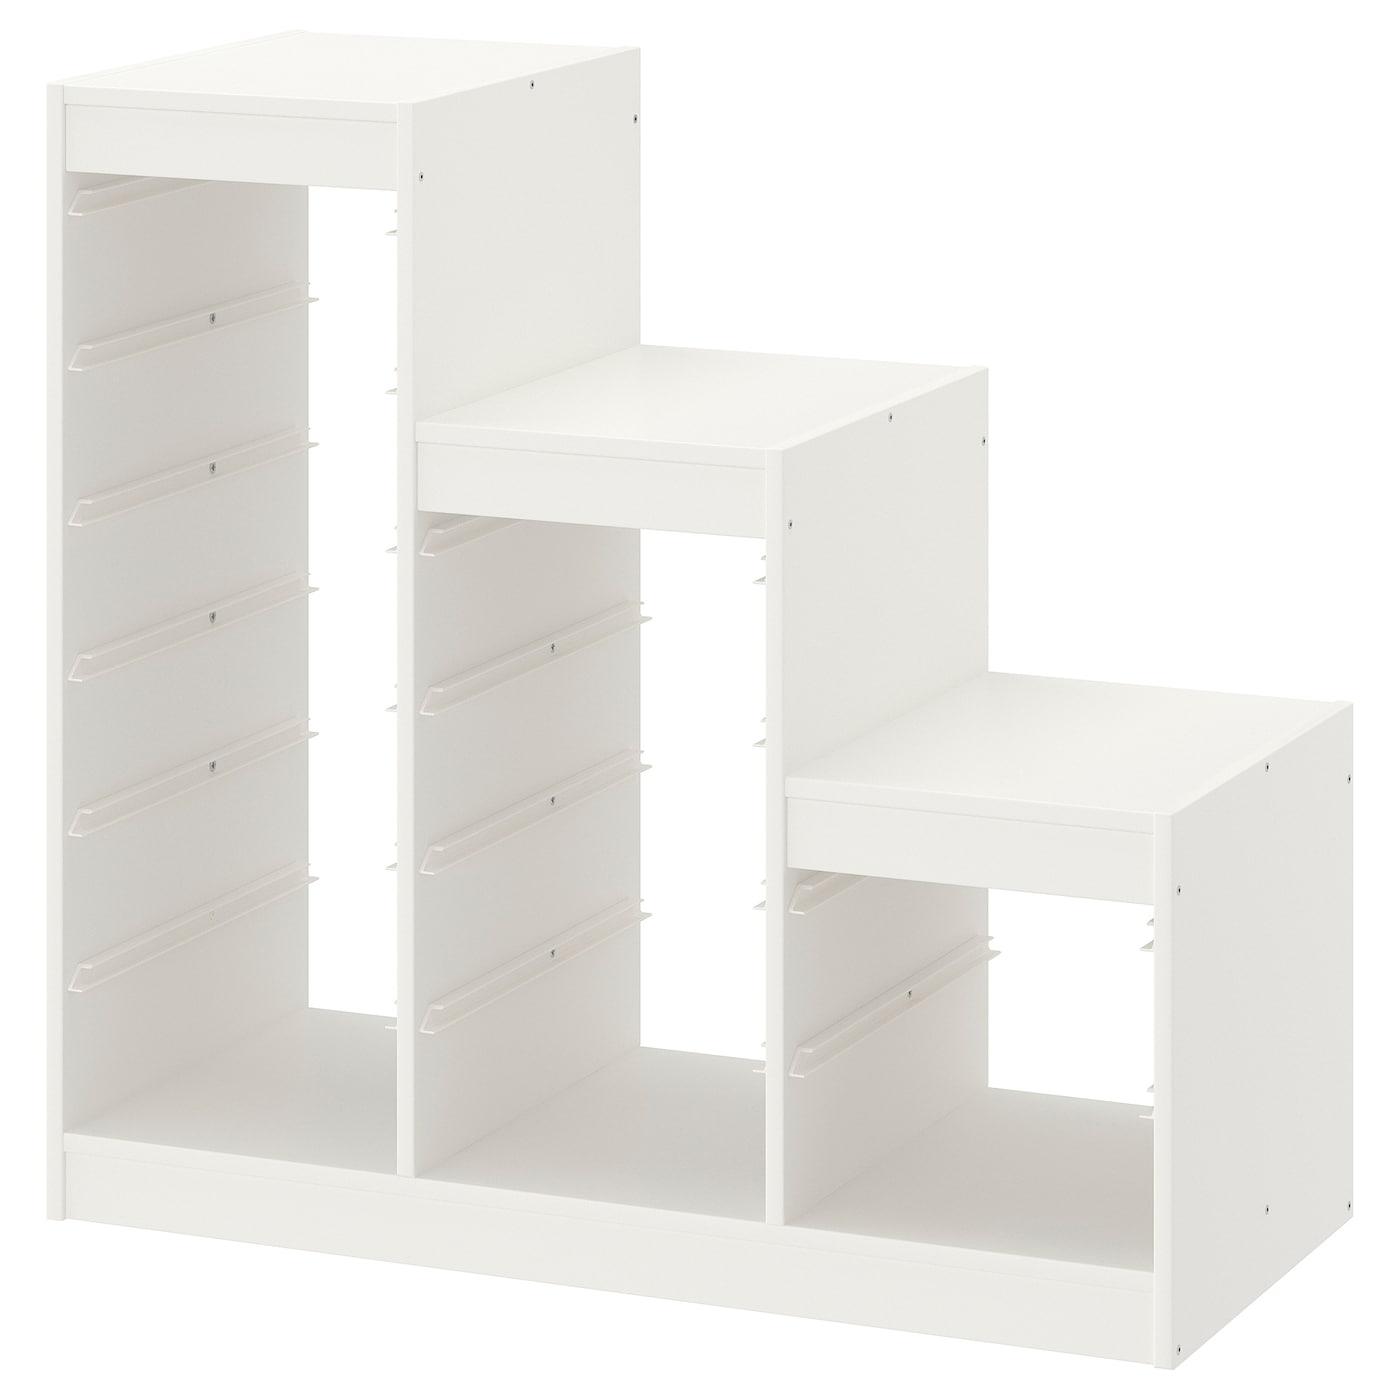 46x30x94 cm Frame White Ikea TROFAST